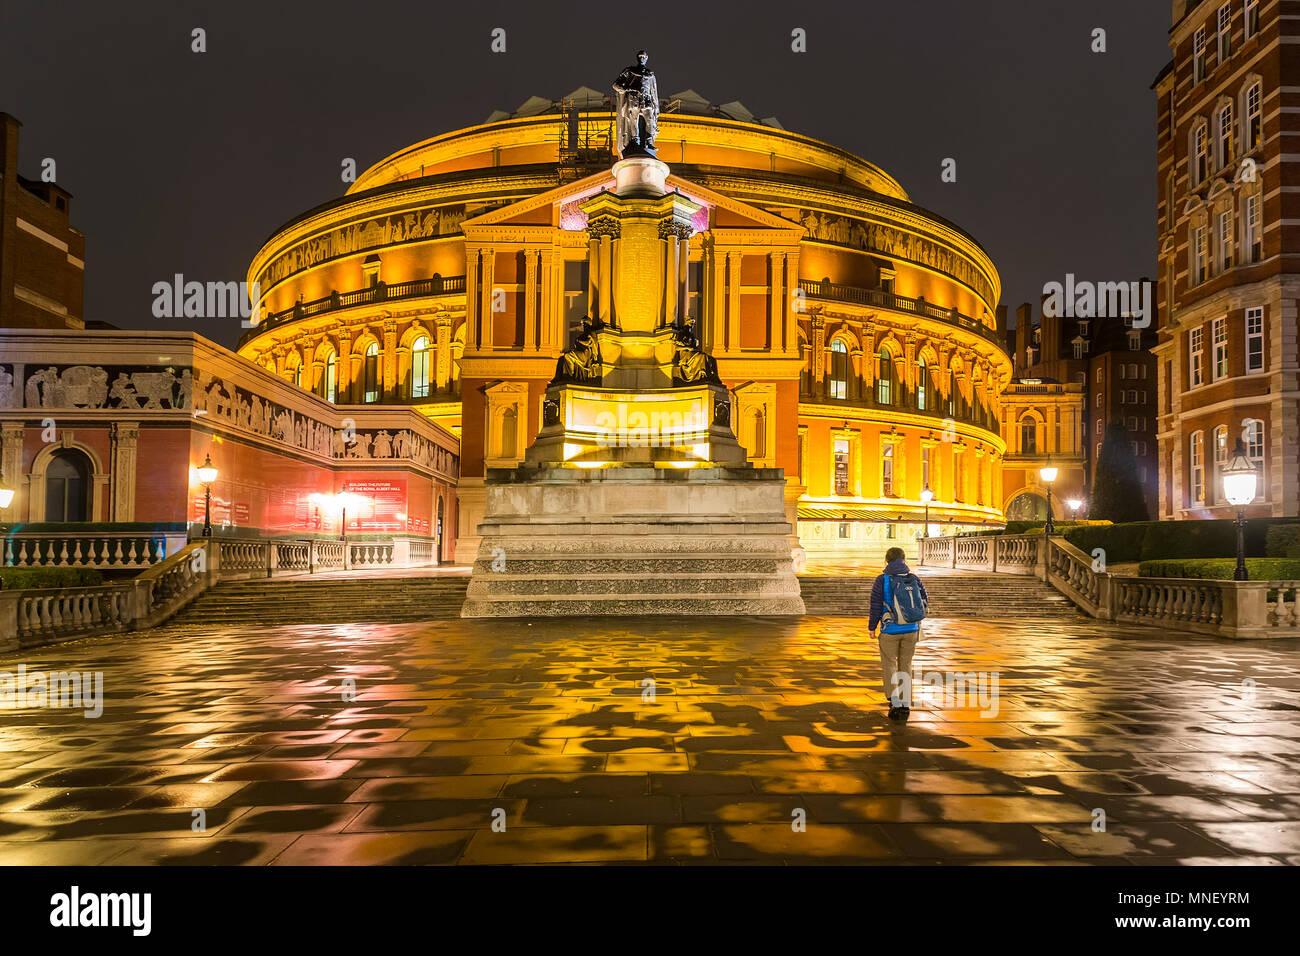 Person walking towards Royal Albert Hall at night, London, UK - Stock Image